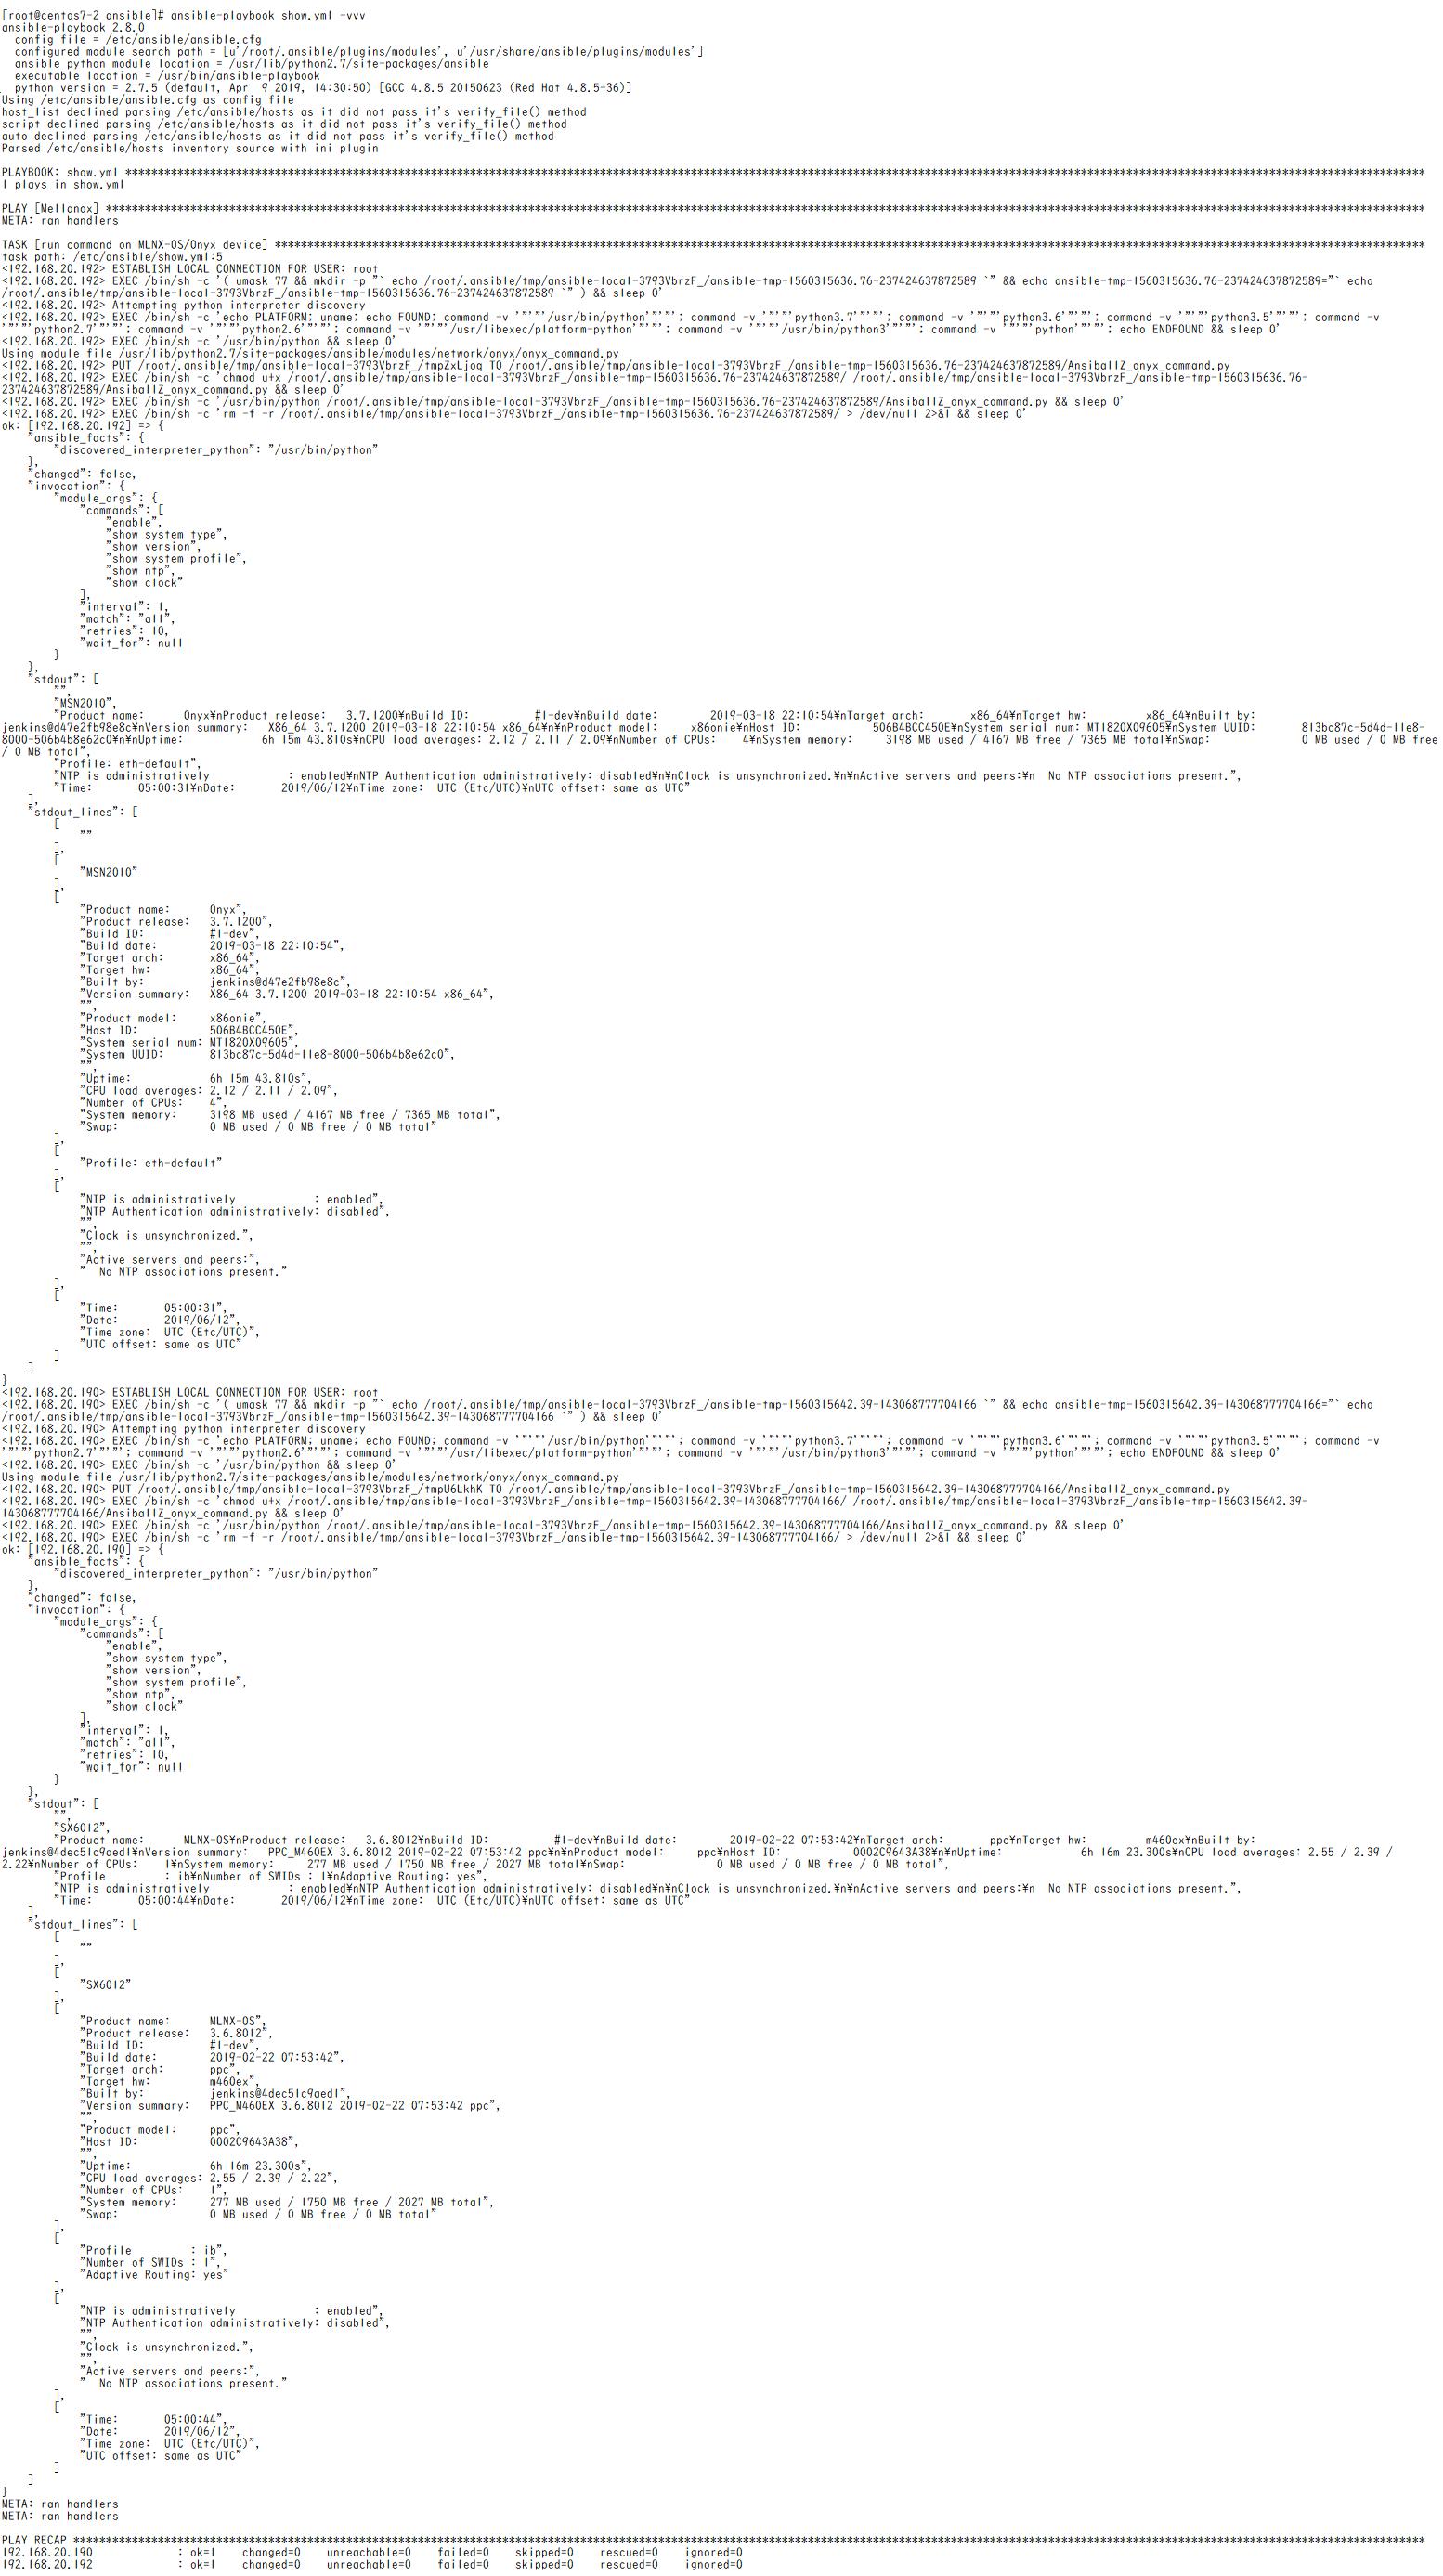 verboseオプションを使用し、debug出力をいれた出力